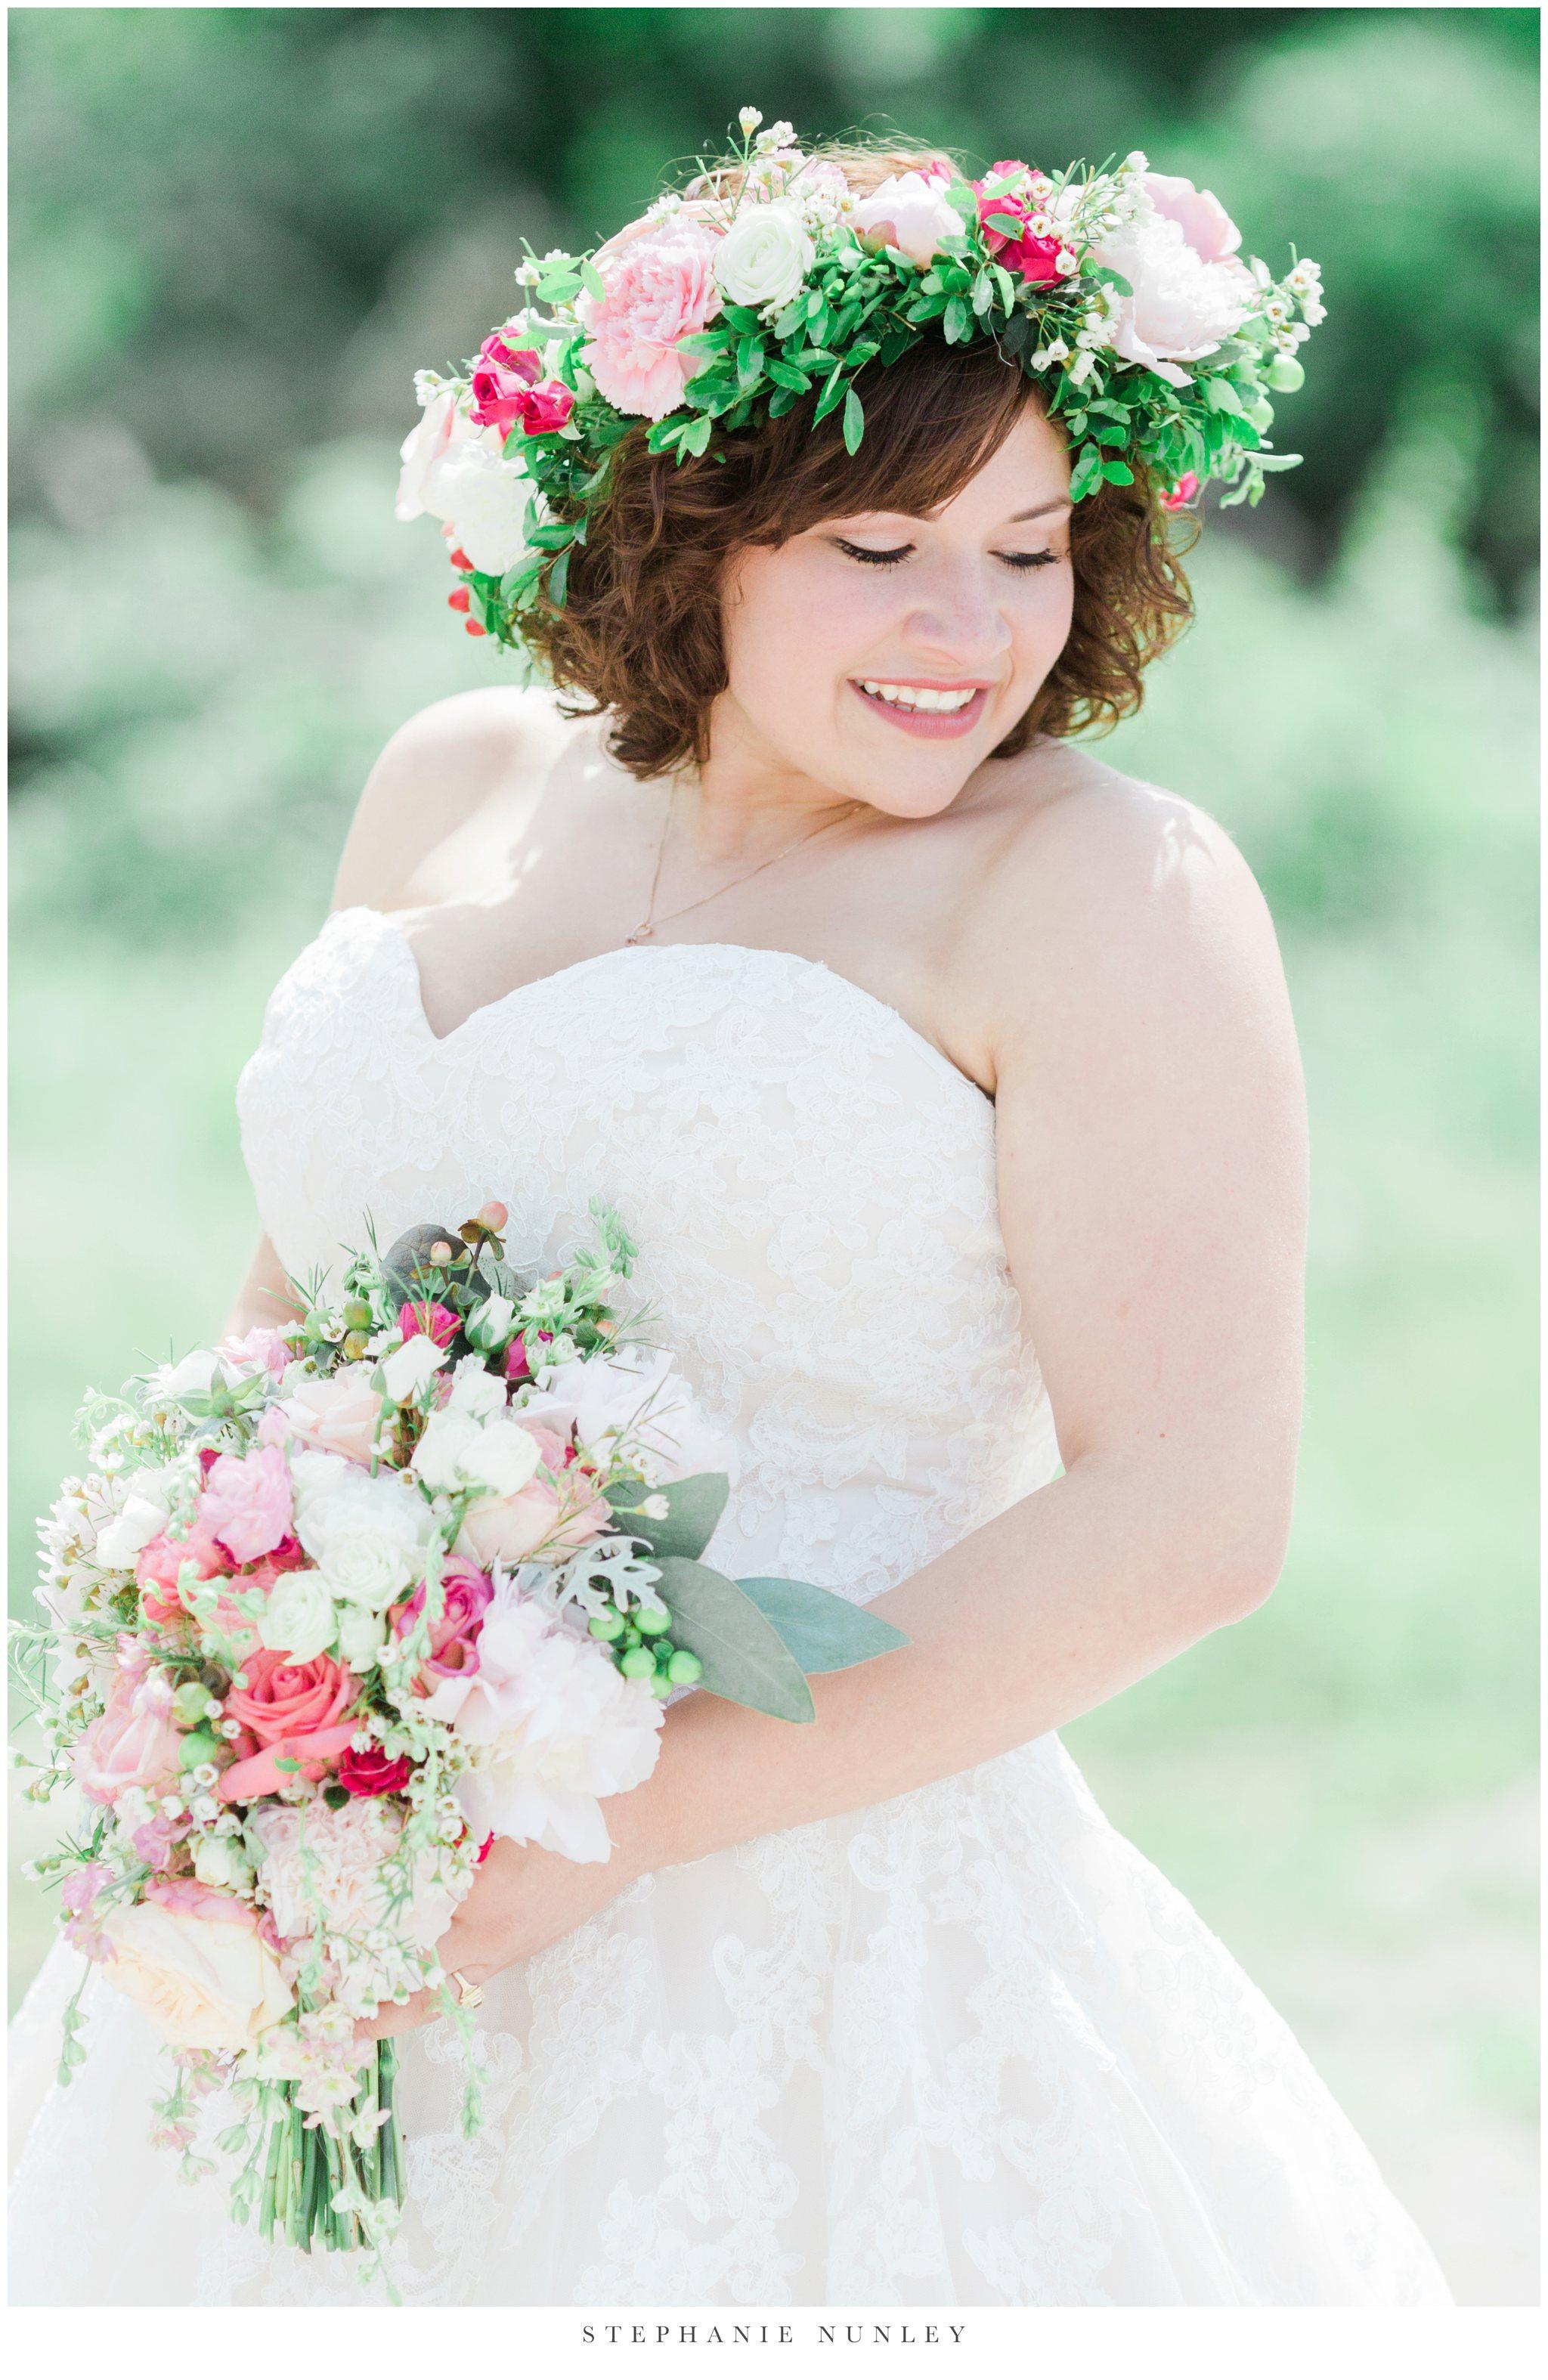 romantic-outdoor-wedding-with-flower-crown-0046.jpg